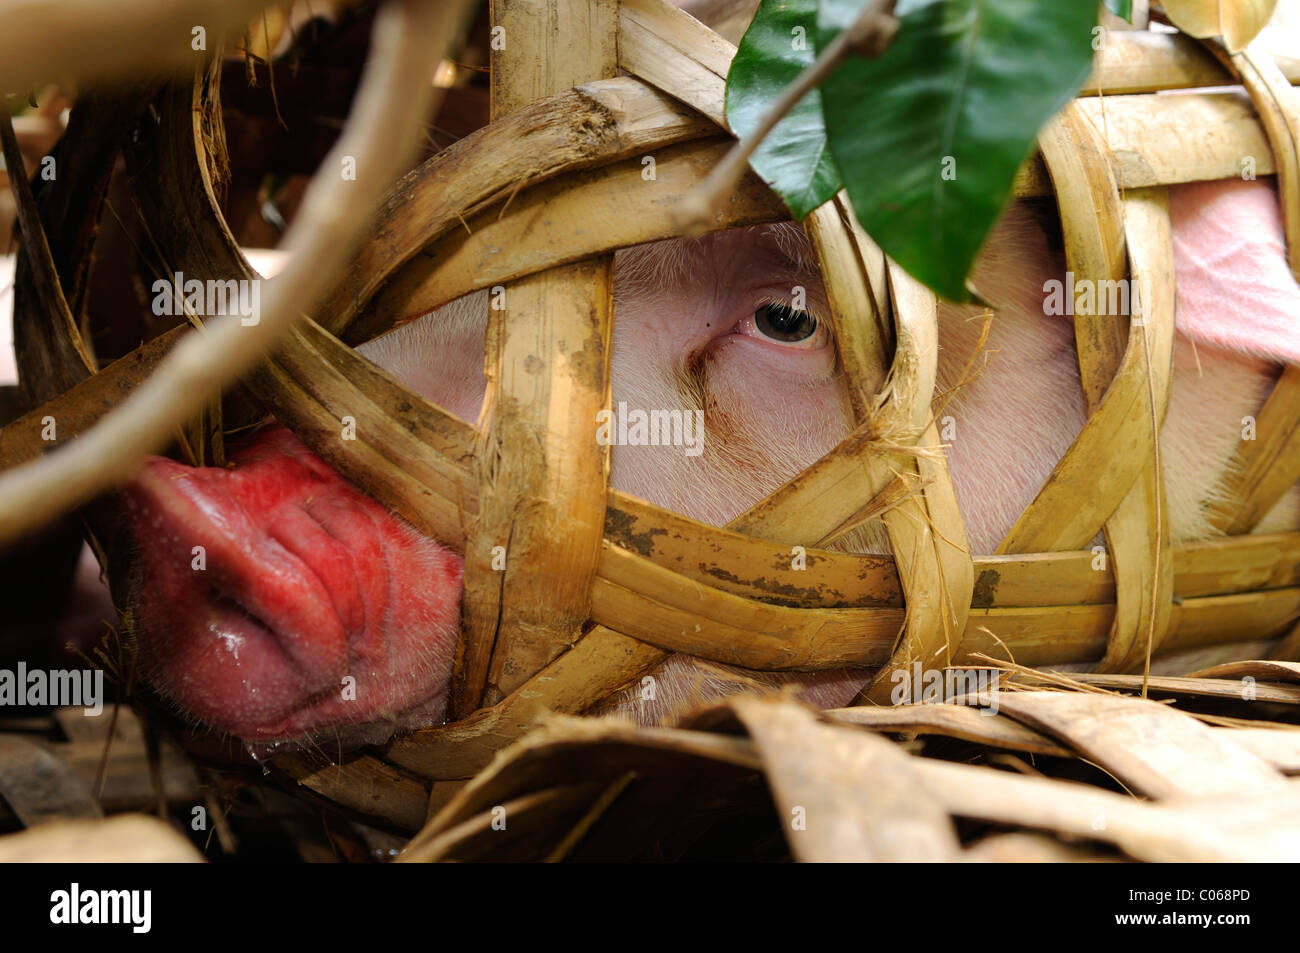 Leiden Hausschwein in Transport-Korb, Vietnam, Asien Stockbild